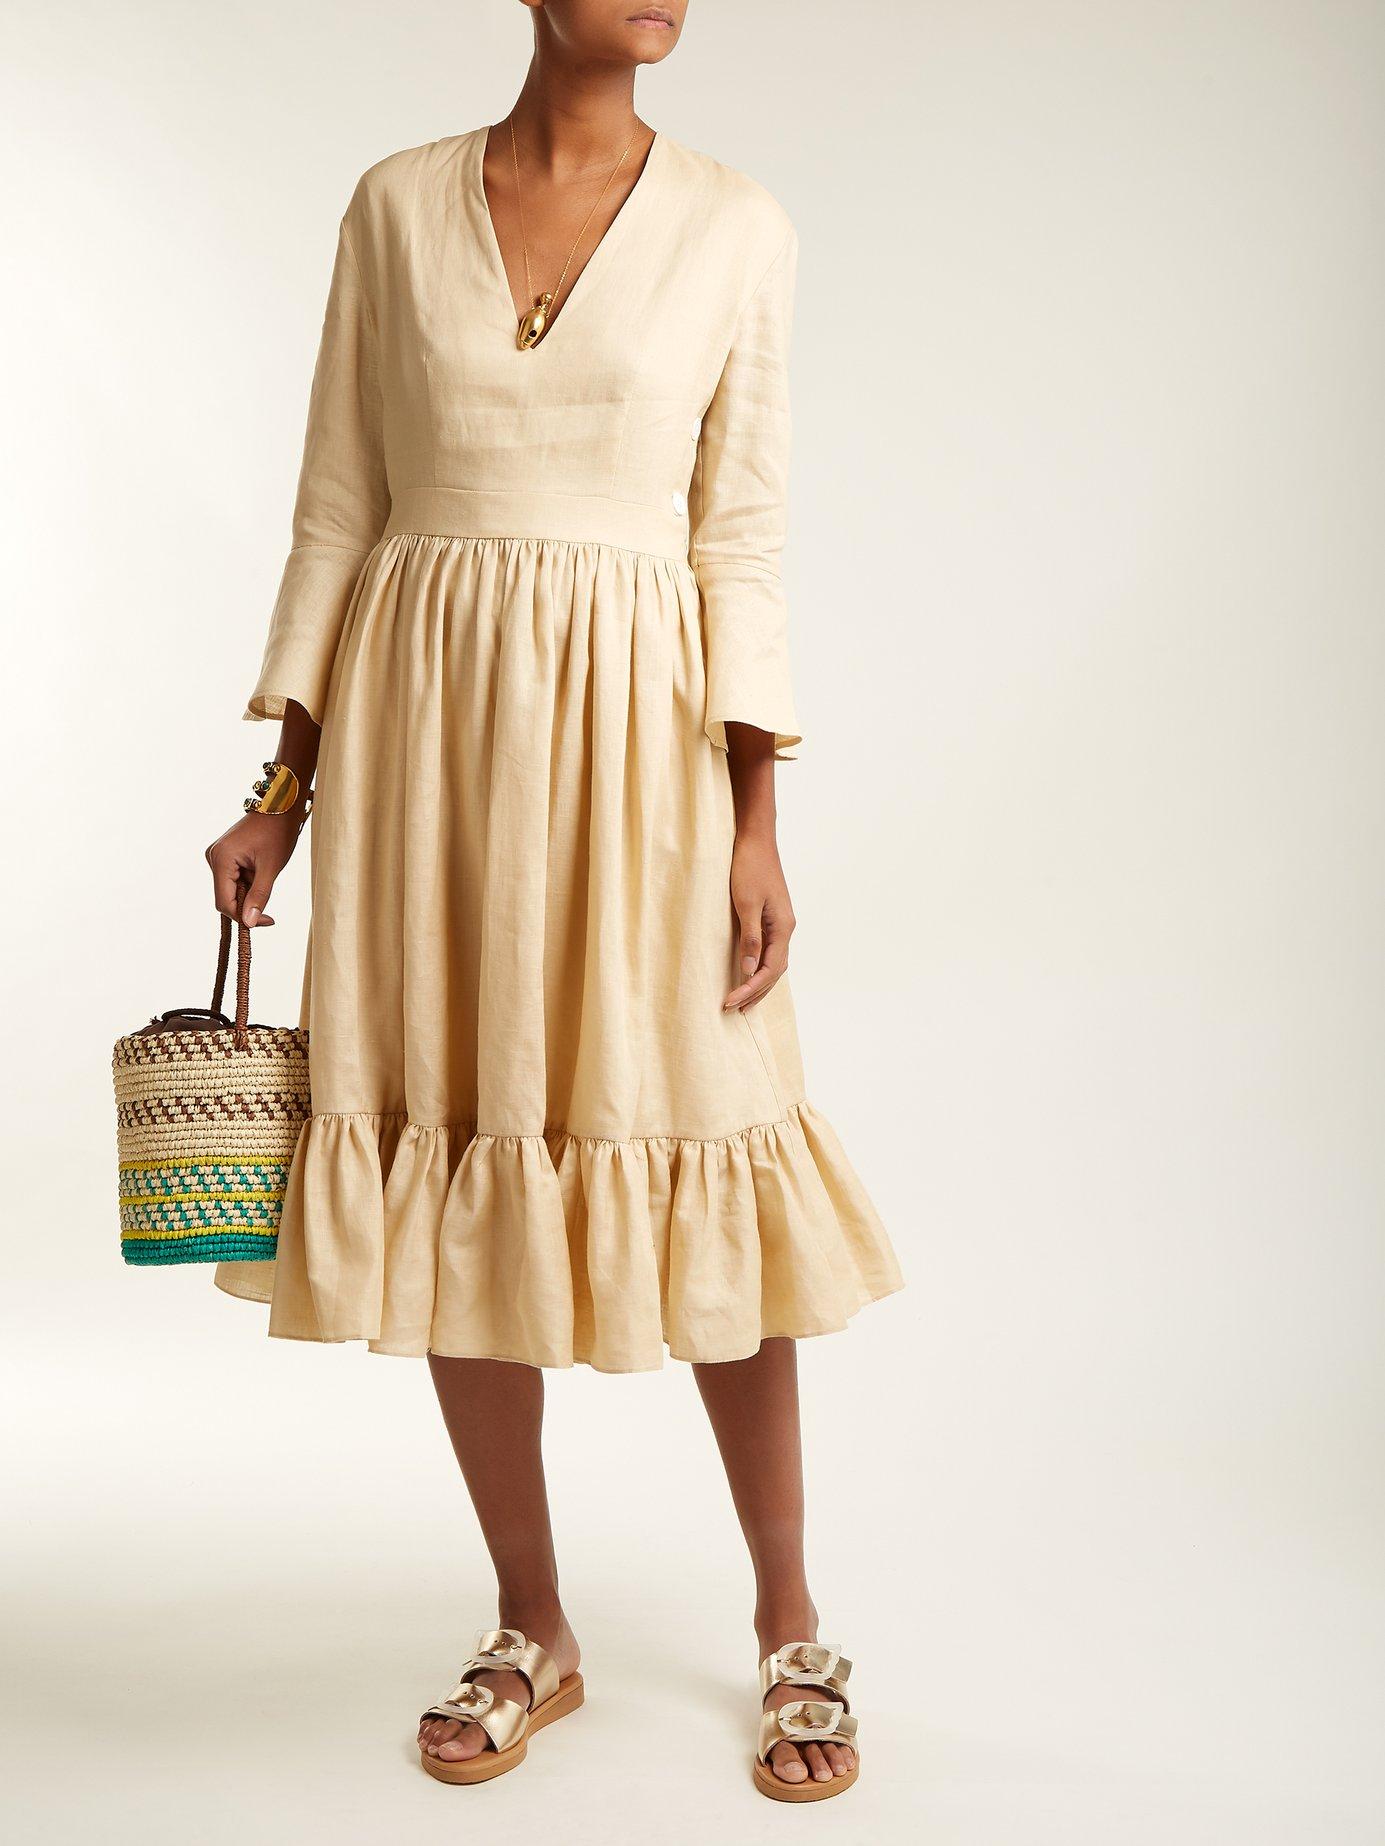 Sea Island bell-sleeve linen dress by Loup Charmant